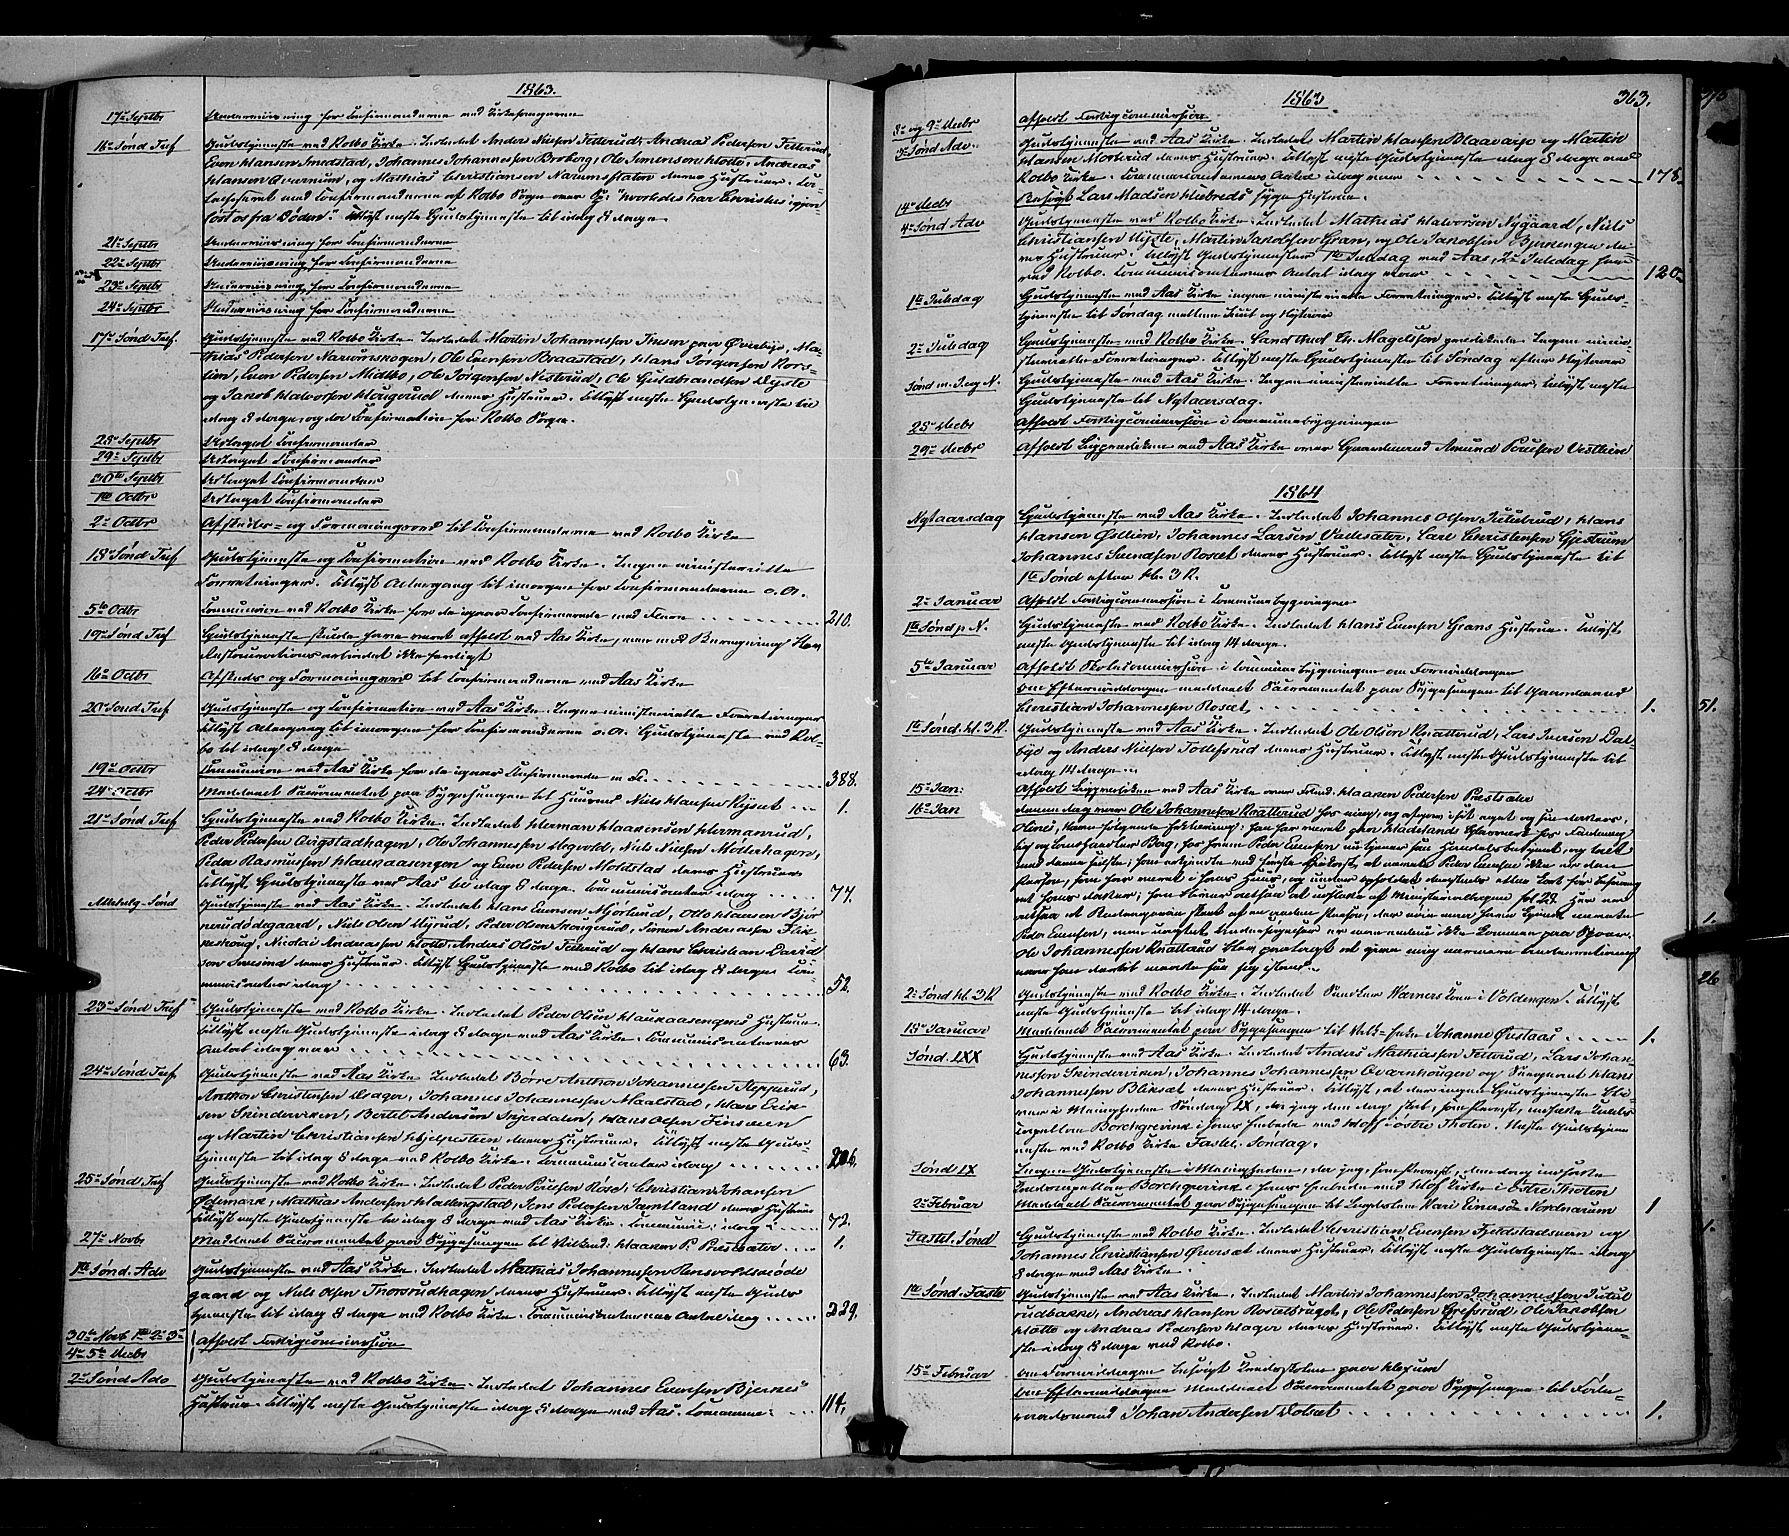 SAH, Vestre Toten prestekontor, H/Ha/Haa/L0007: Ministerialbok nr. 7, 1862-1869, s. 363